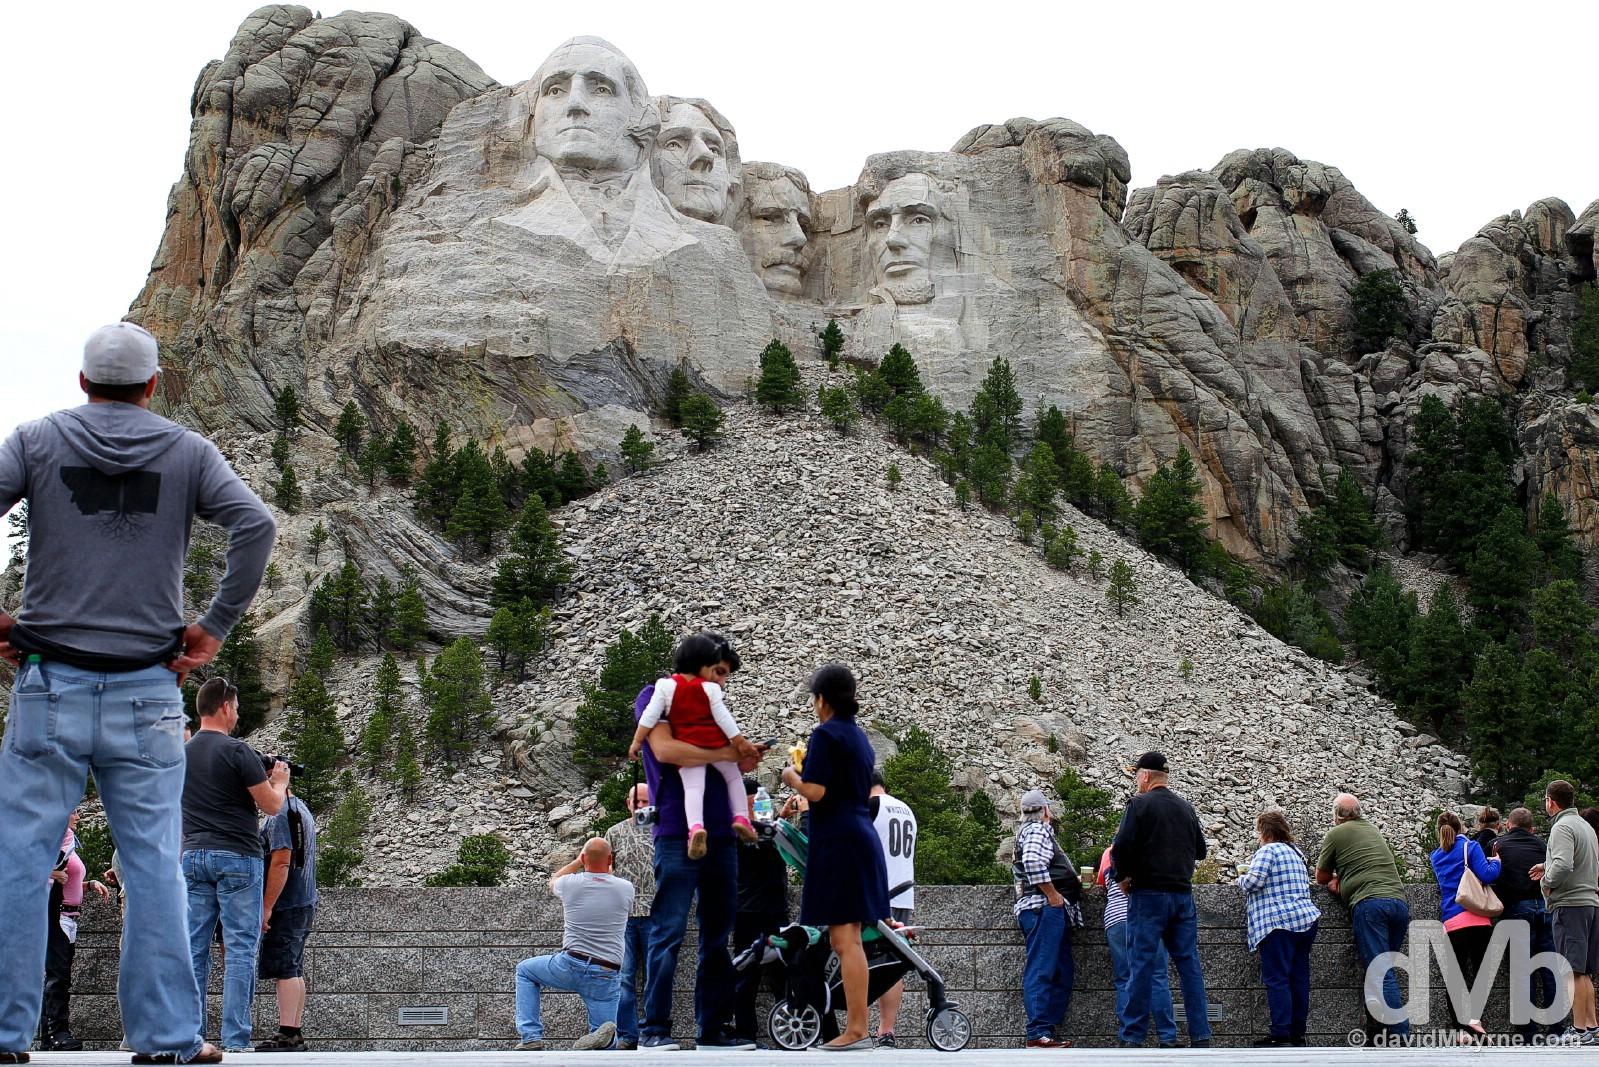 At the Grand View Terrace of Mount Rushmore National Memorial, Black Hills, South Dakota, USA. September 2, 2016.